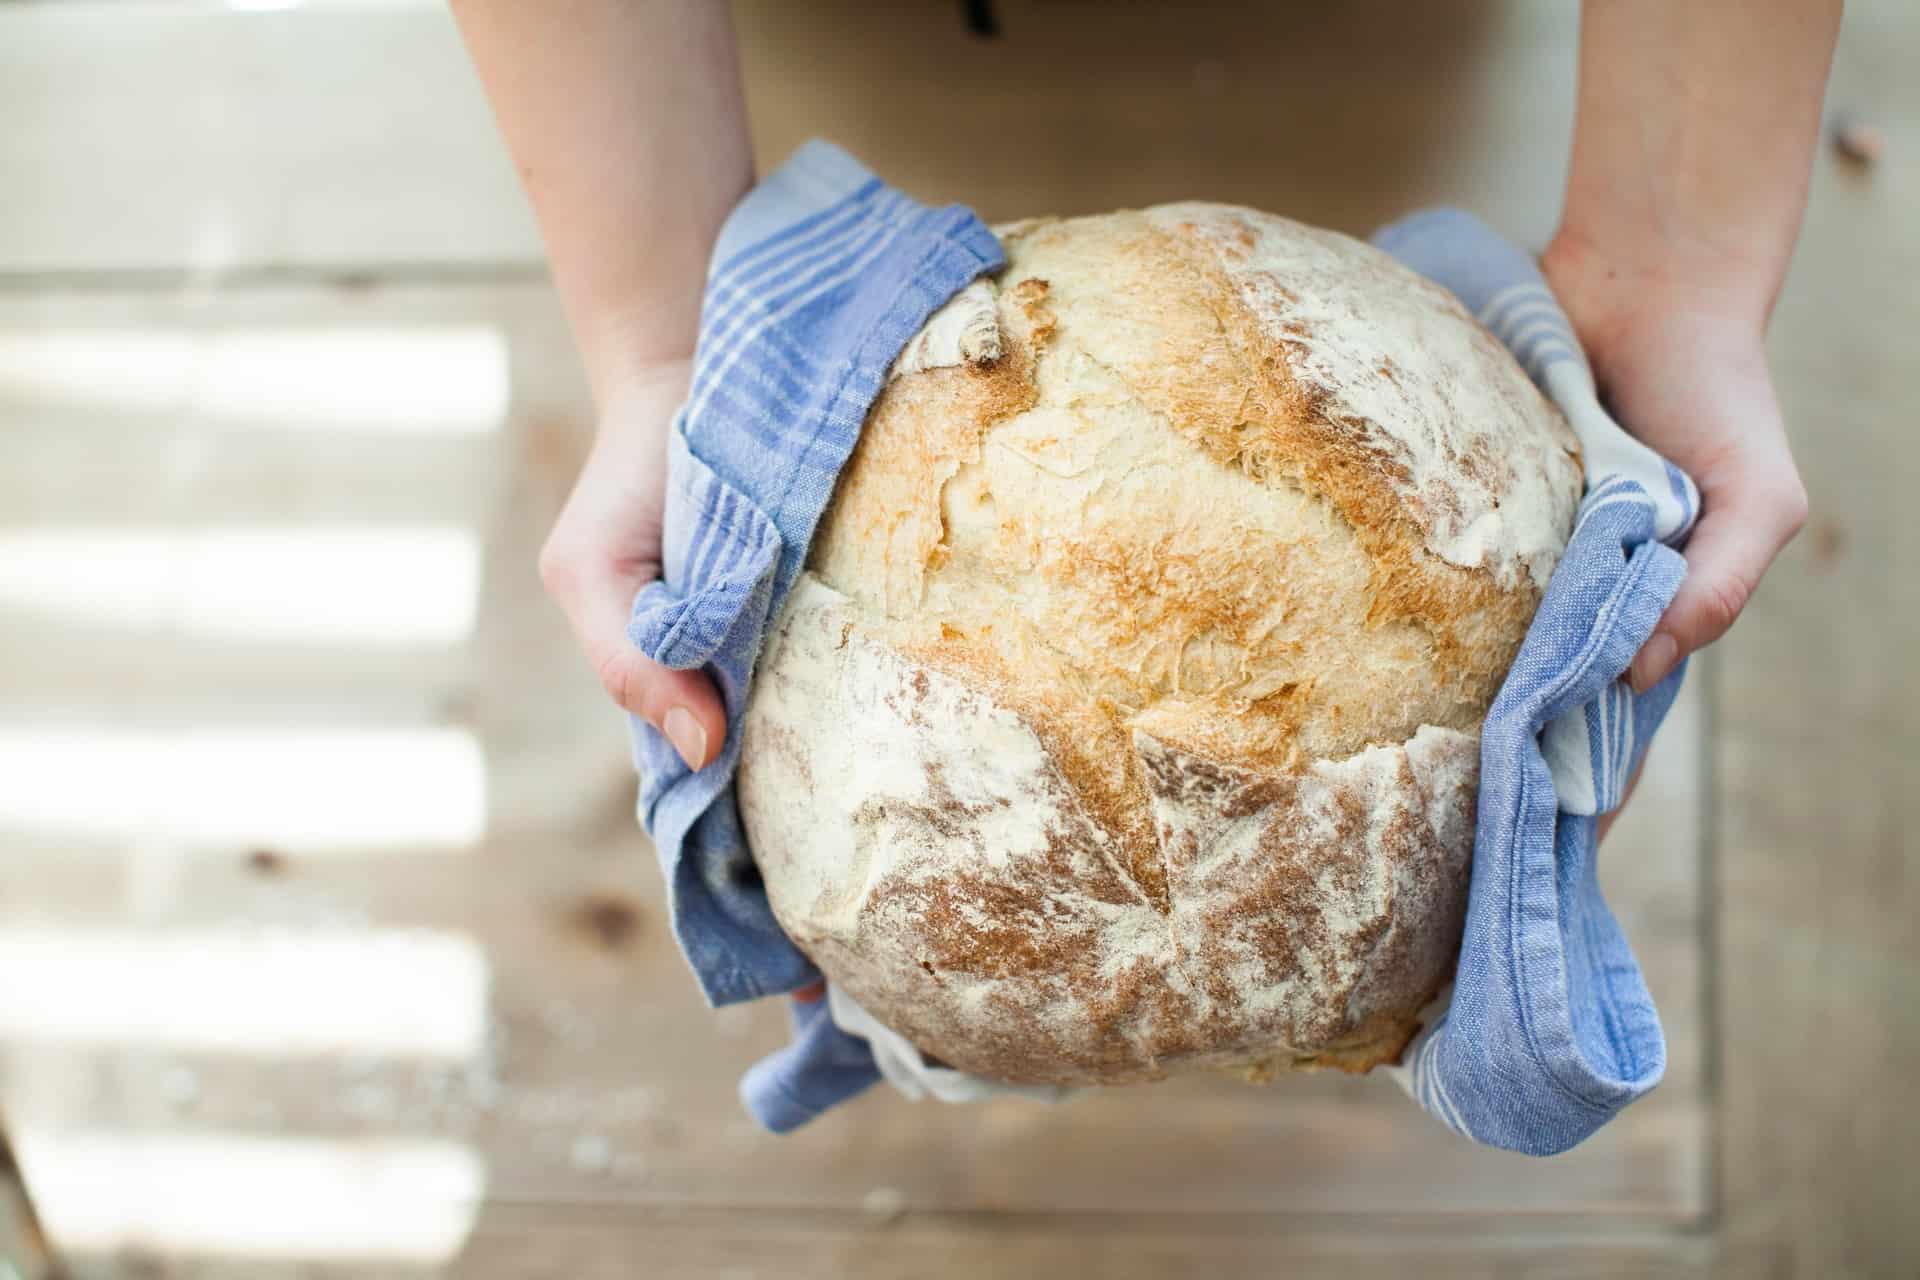 Should you go gluten-free? Part 2 | mamaknowsnutrition.com